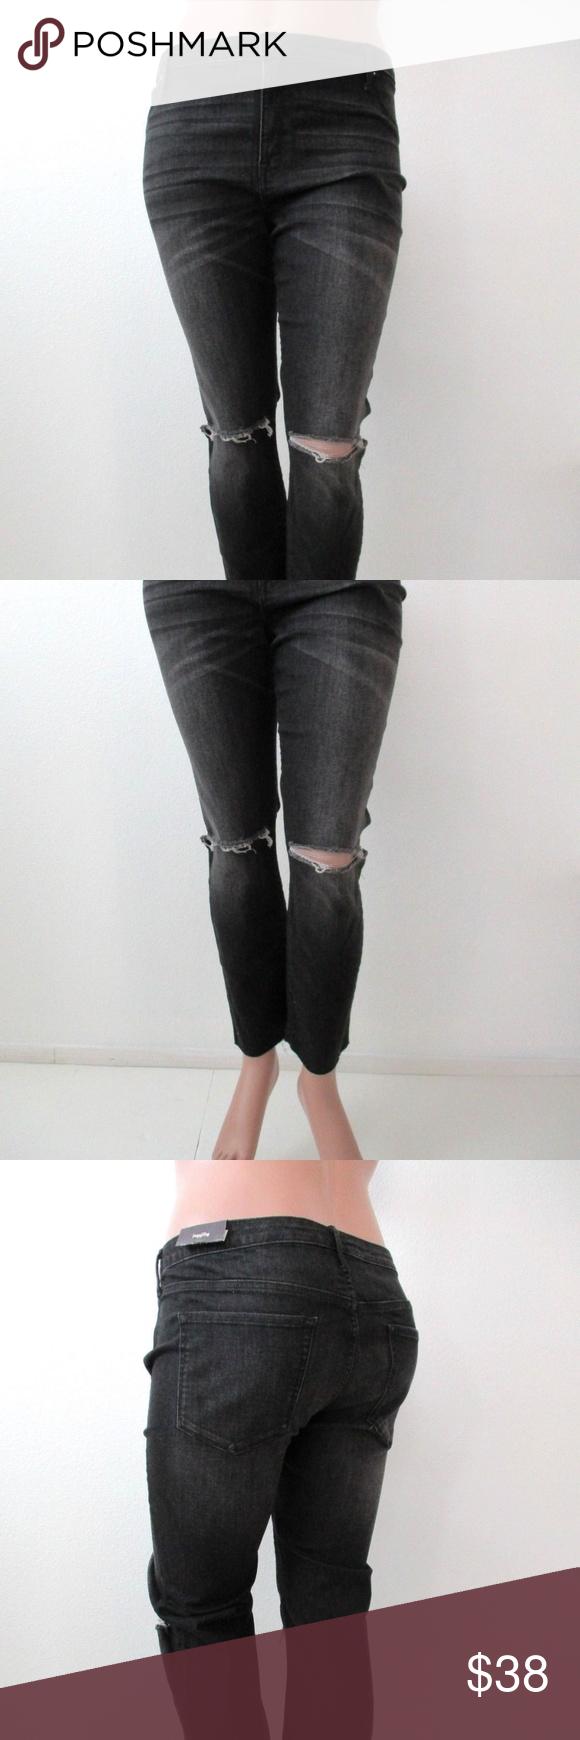 9293387bf10d0a AVA & VIV Jeans RIPPED Jeggings PLUS SIZE 22W NWT AVA & VIV Jeans